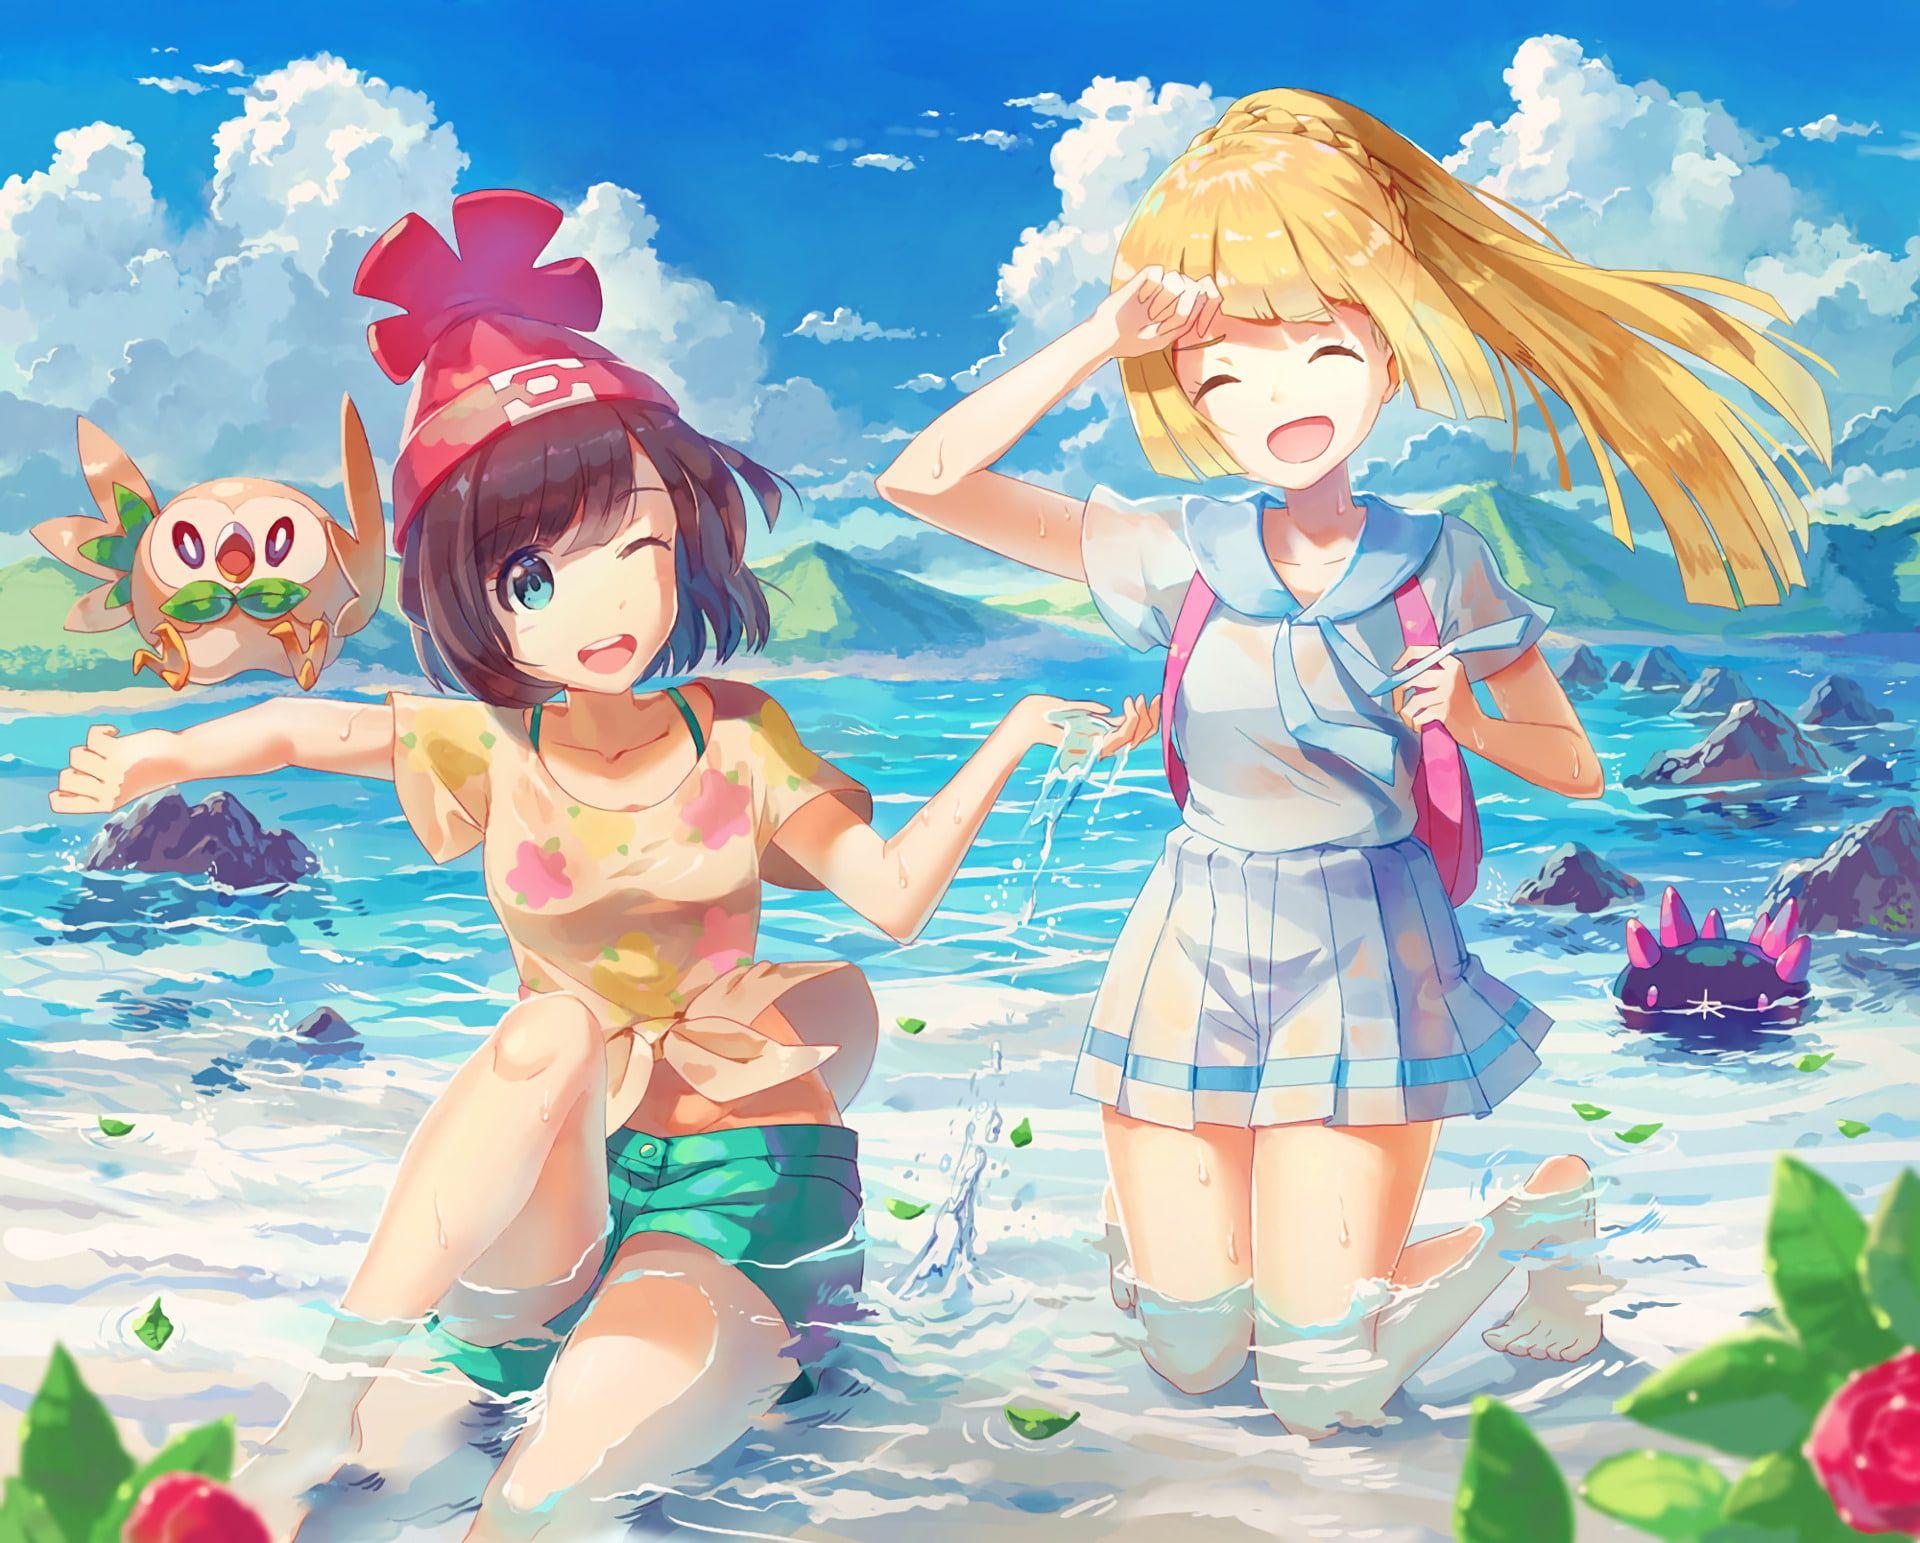 HD wallpaper: Pokémon, Pokémon: Sun and Moon, Lillie (Pokemon), Moon (Pokémon)